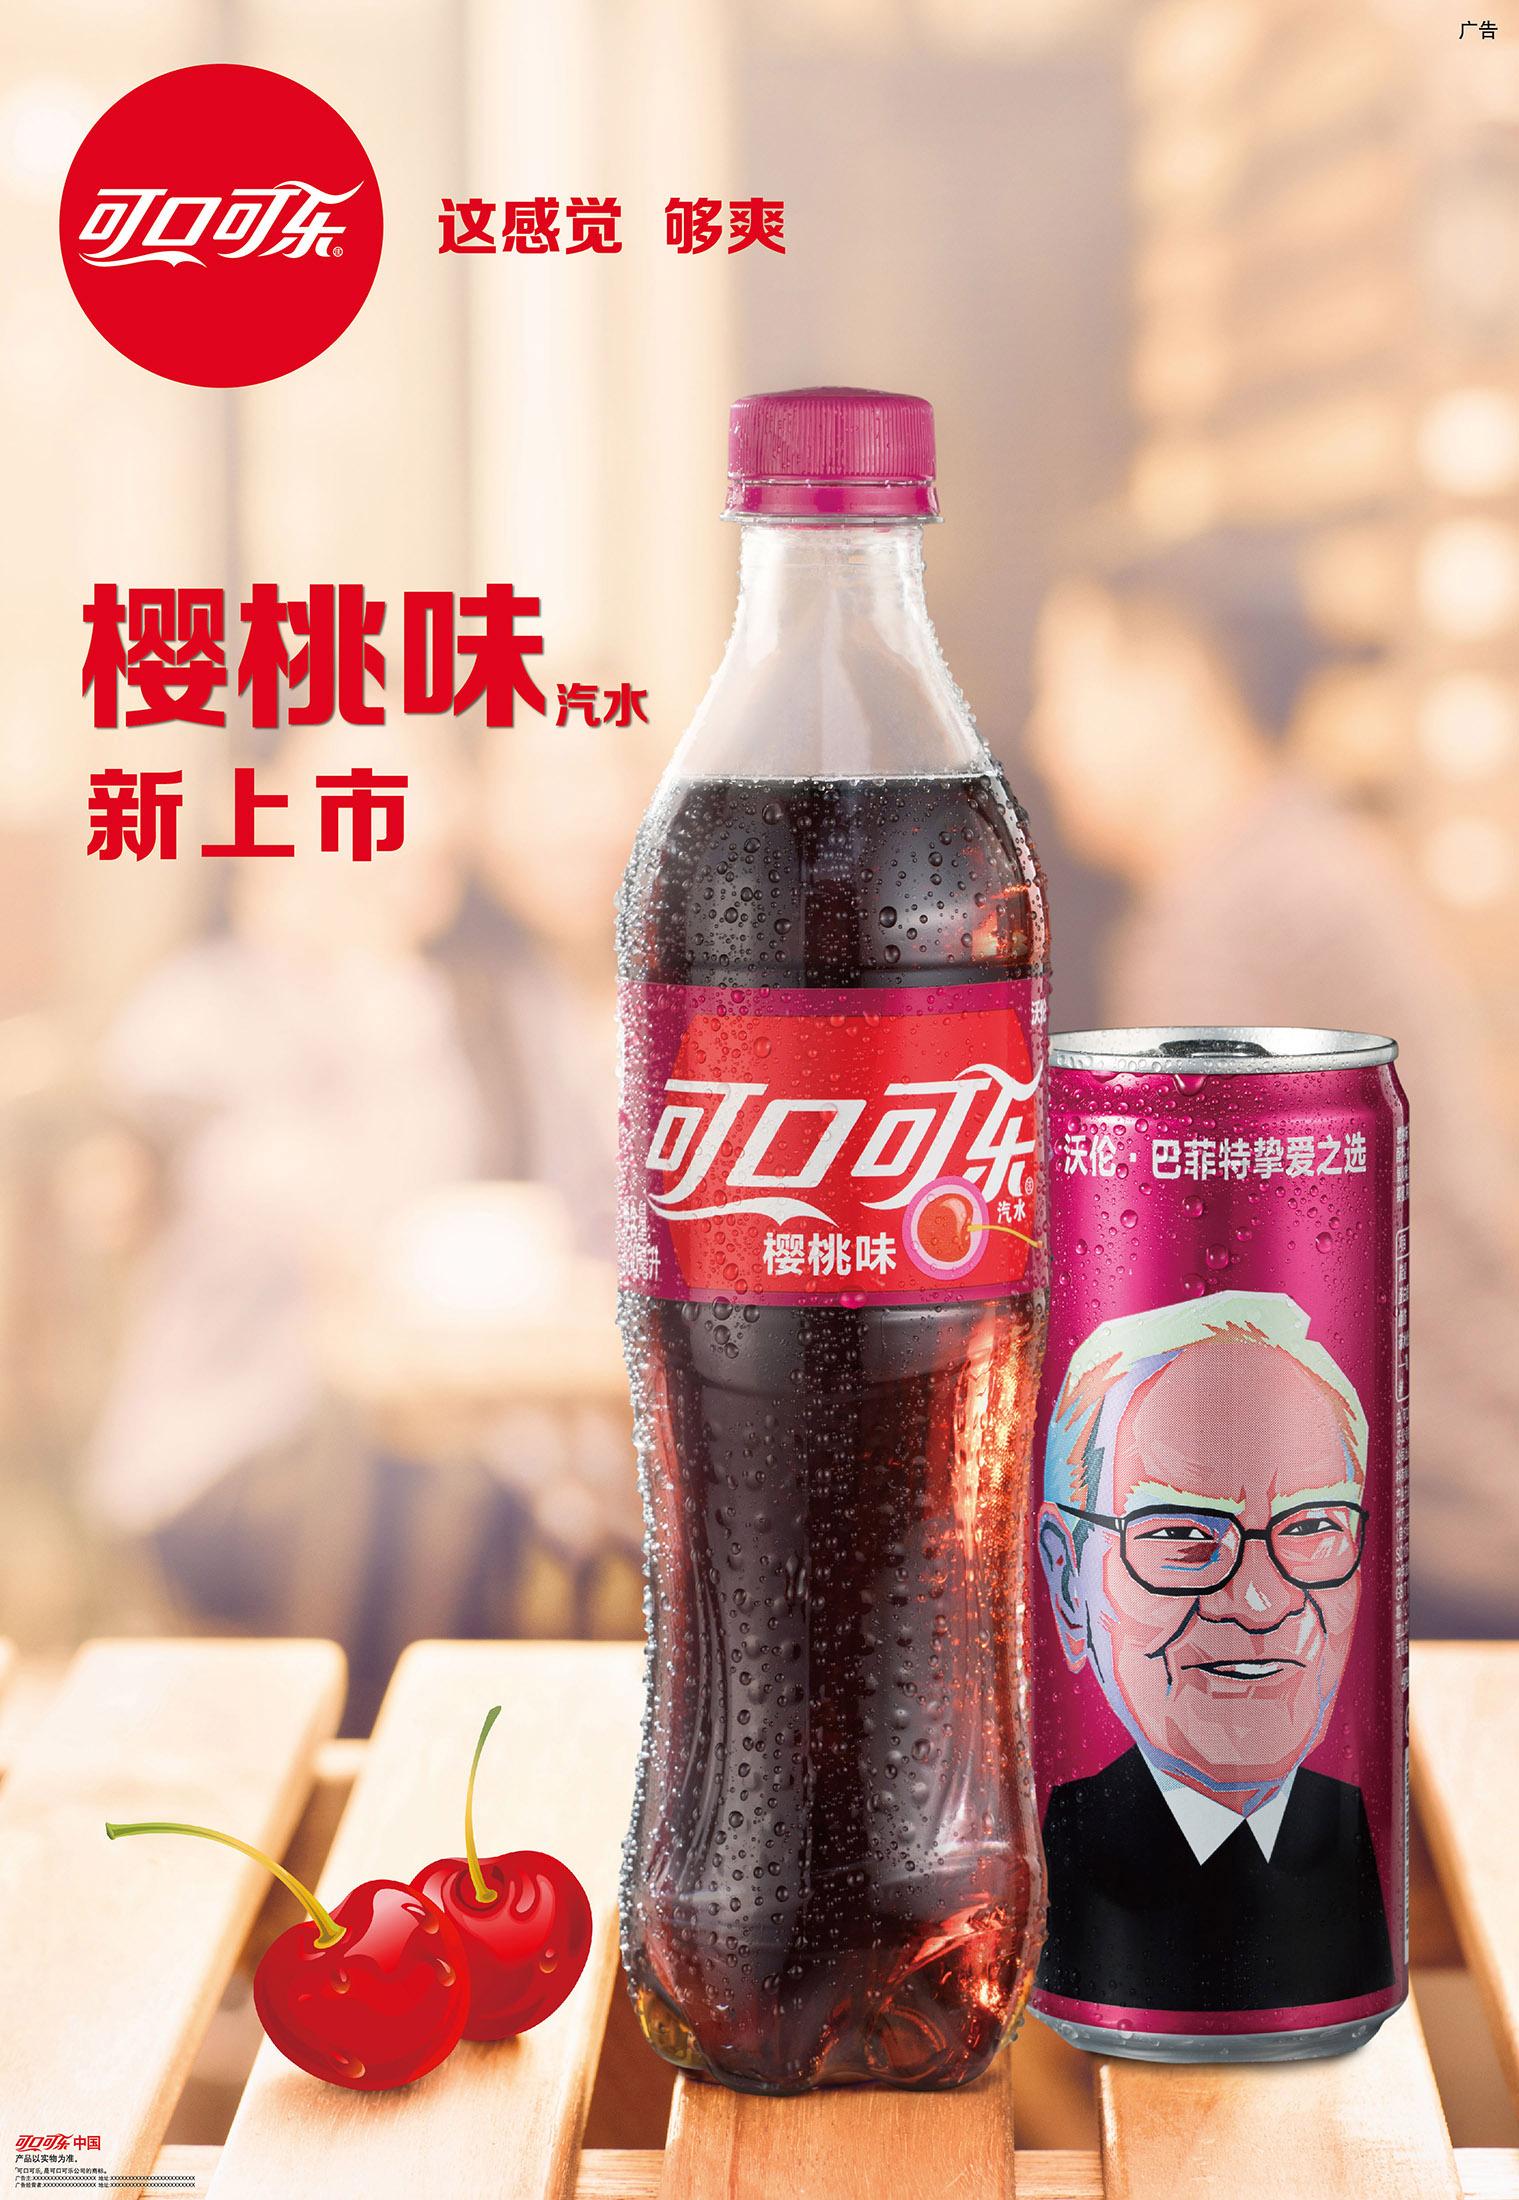 <strong>Warren Buffet appears on Cherry Coke</strong>